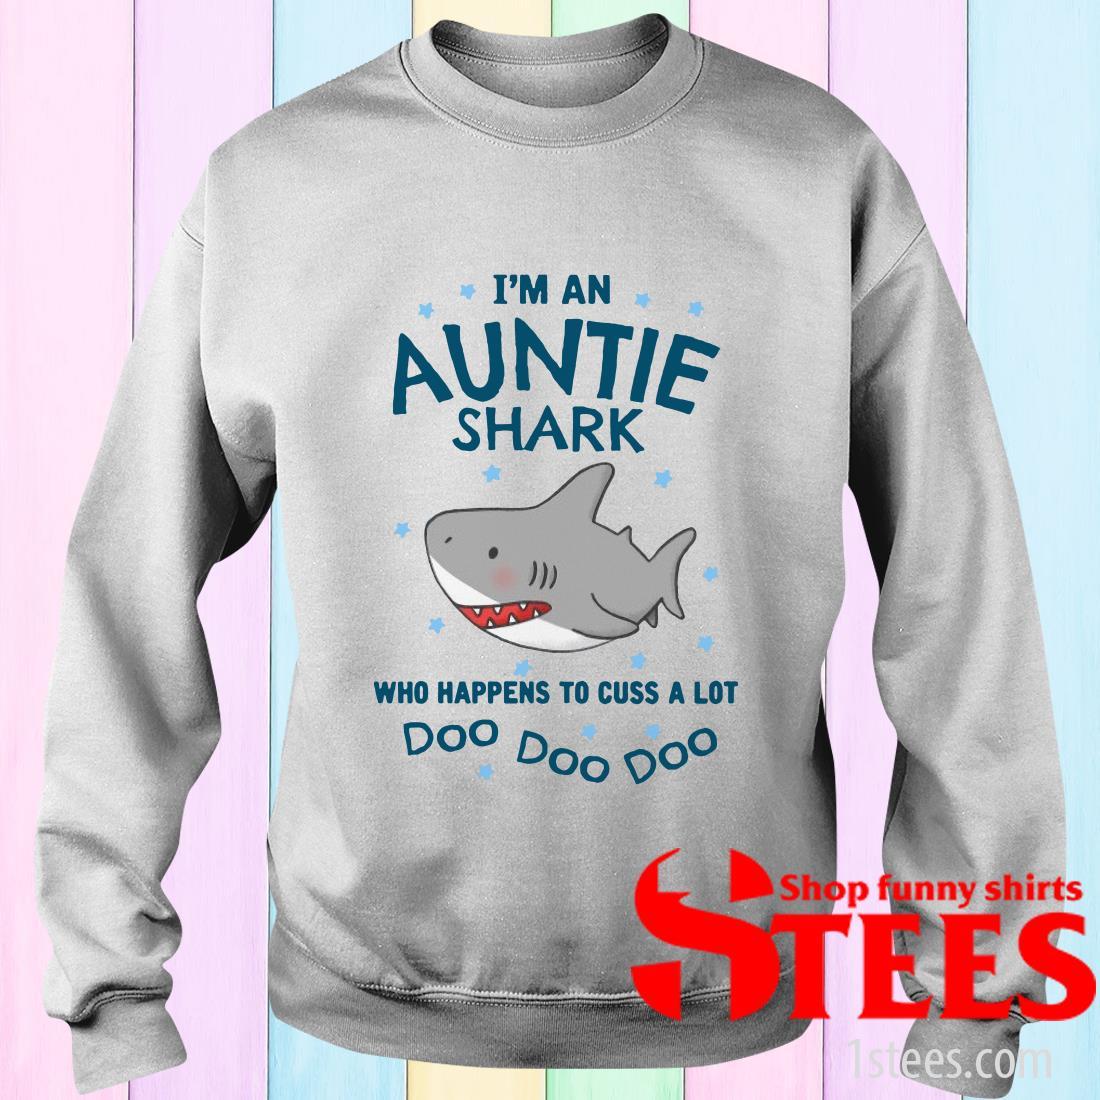 I'm An Auntie Shark Who Happens To Cuss A Lot Doo Doo Doo Sweater